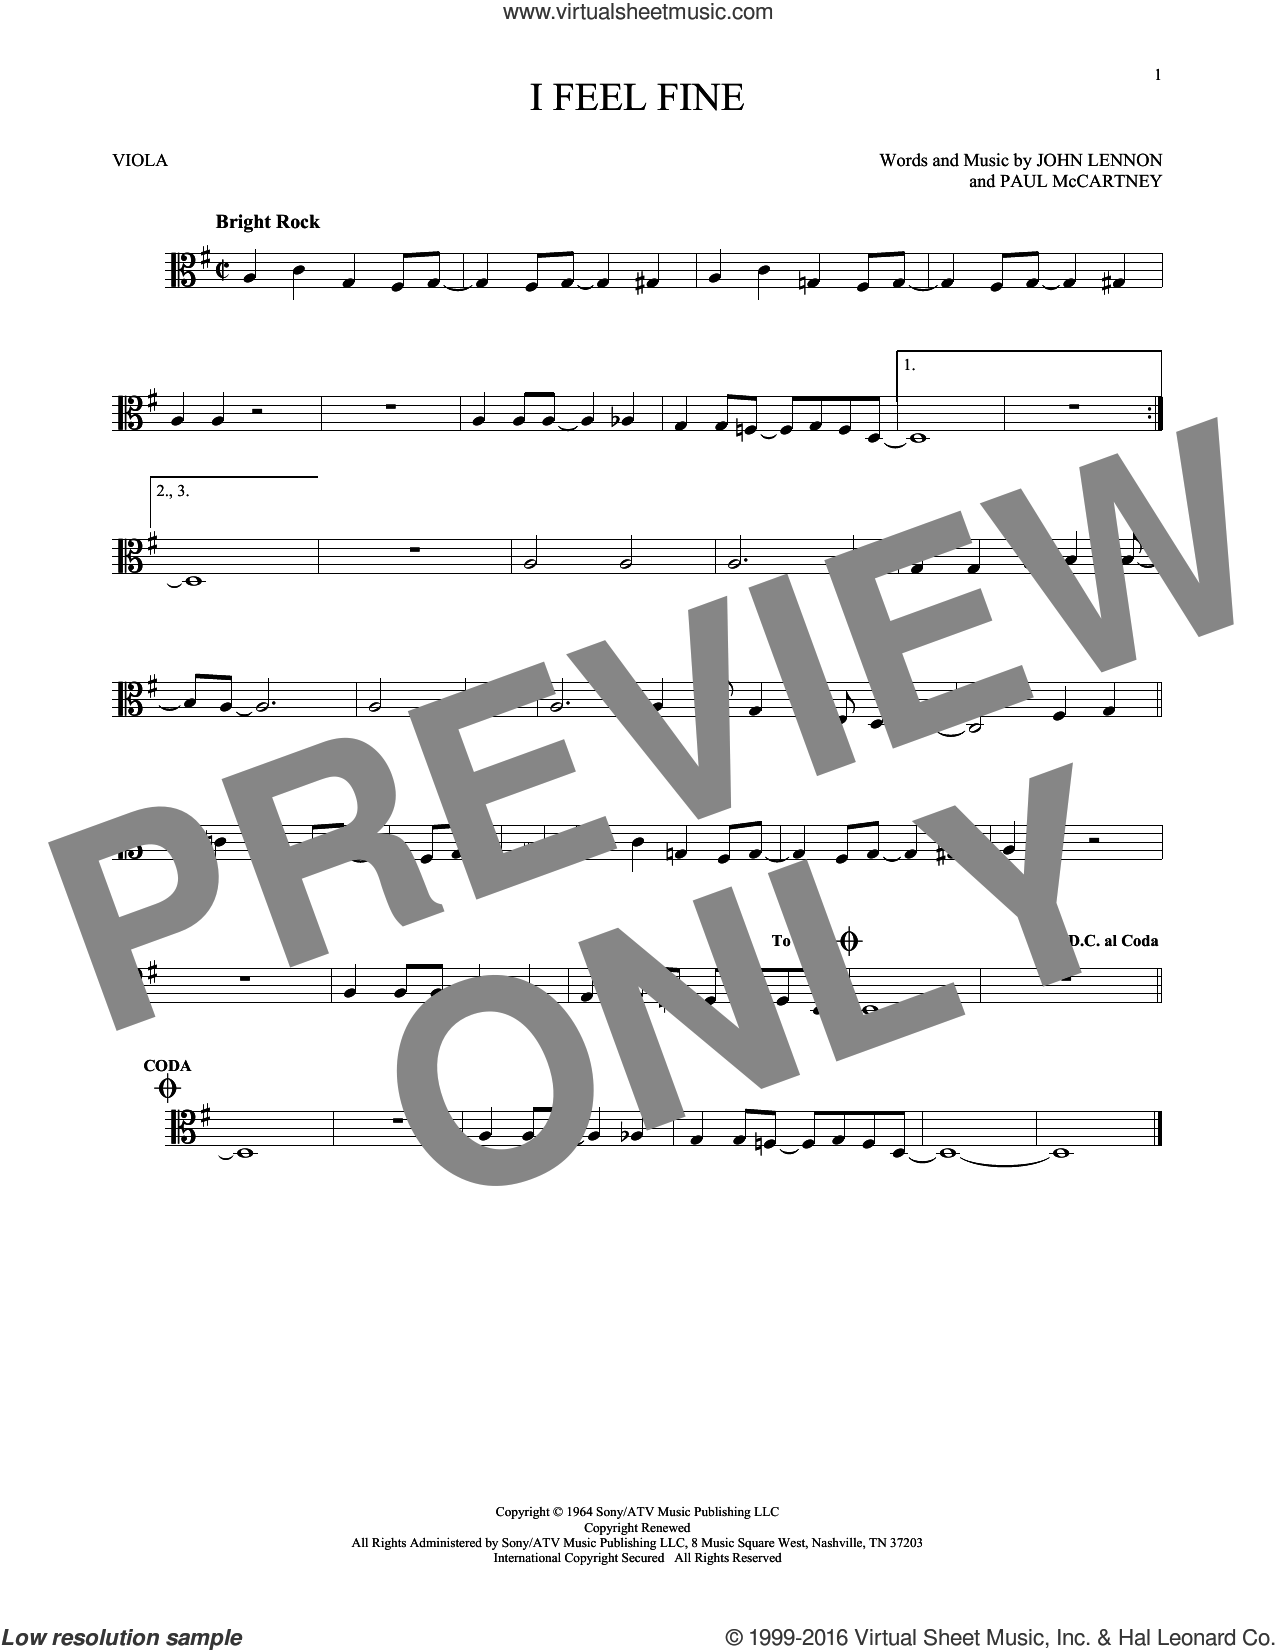 I Feel Fine sheet music for viola solo by The Beatles, John Lennon and Paul McCartney, intermediate skill level